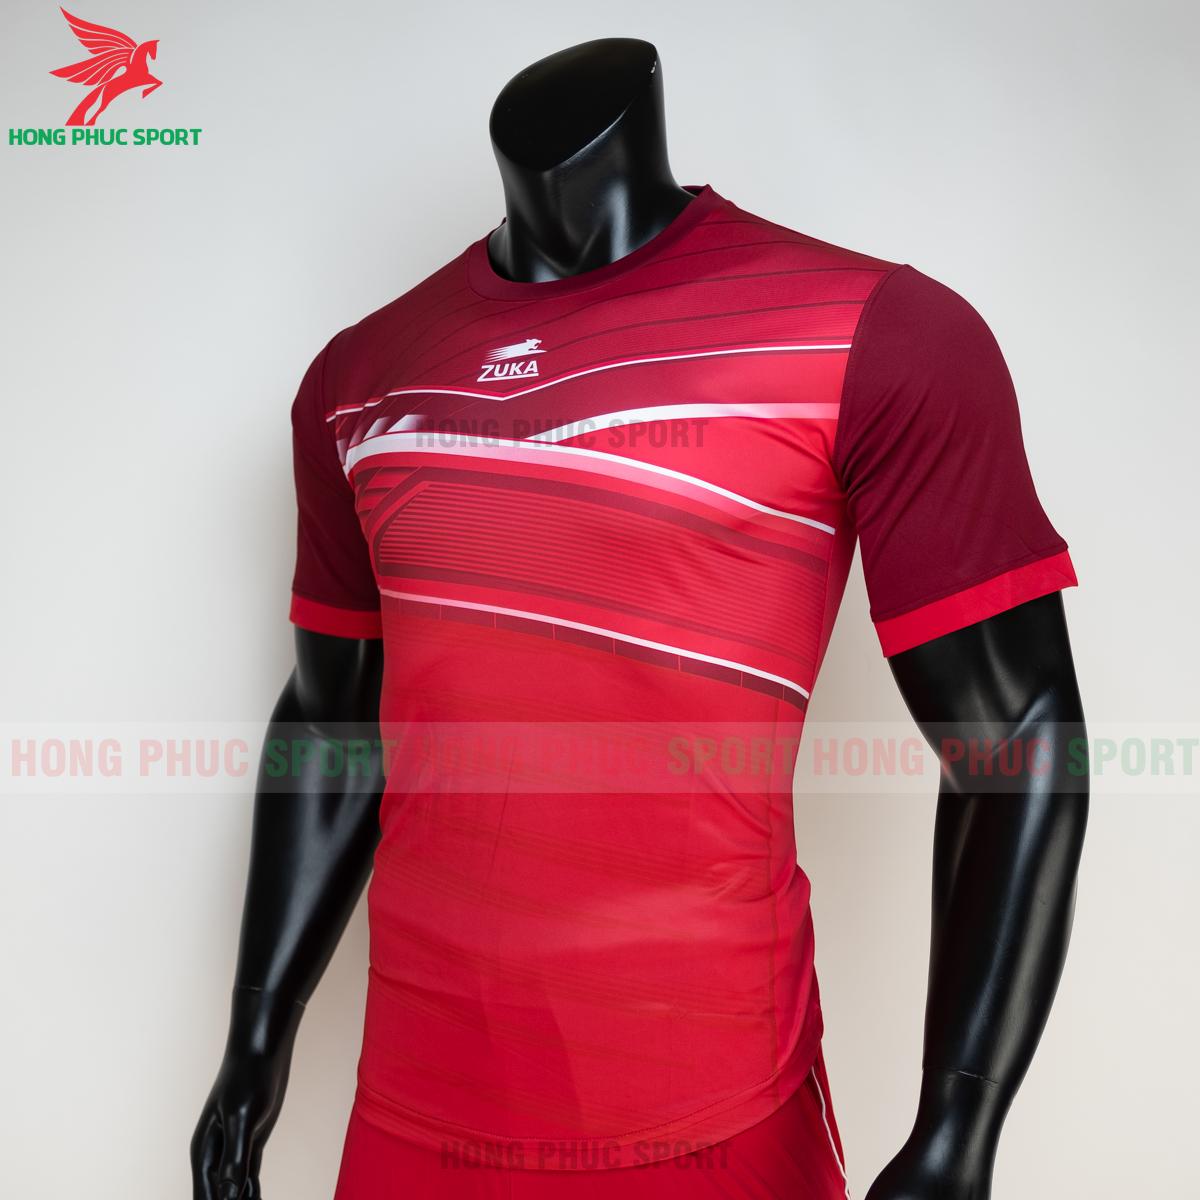 https://cdn.hongphucsport.com/unsafe/s4.shopbay.vn/files/285/ao-bong-da-khong-logo-zuka-01-mau-do-4-60502d4c39d27.png